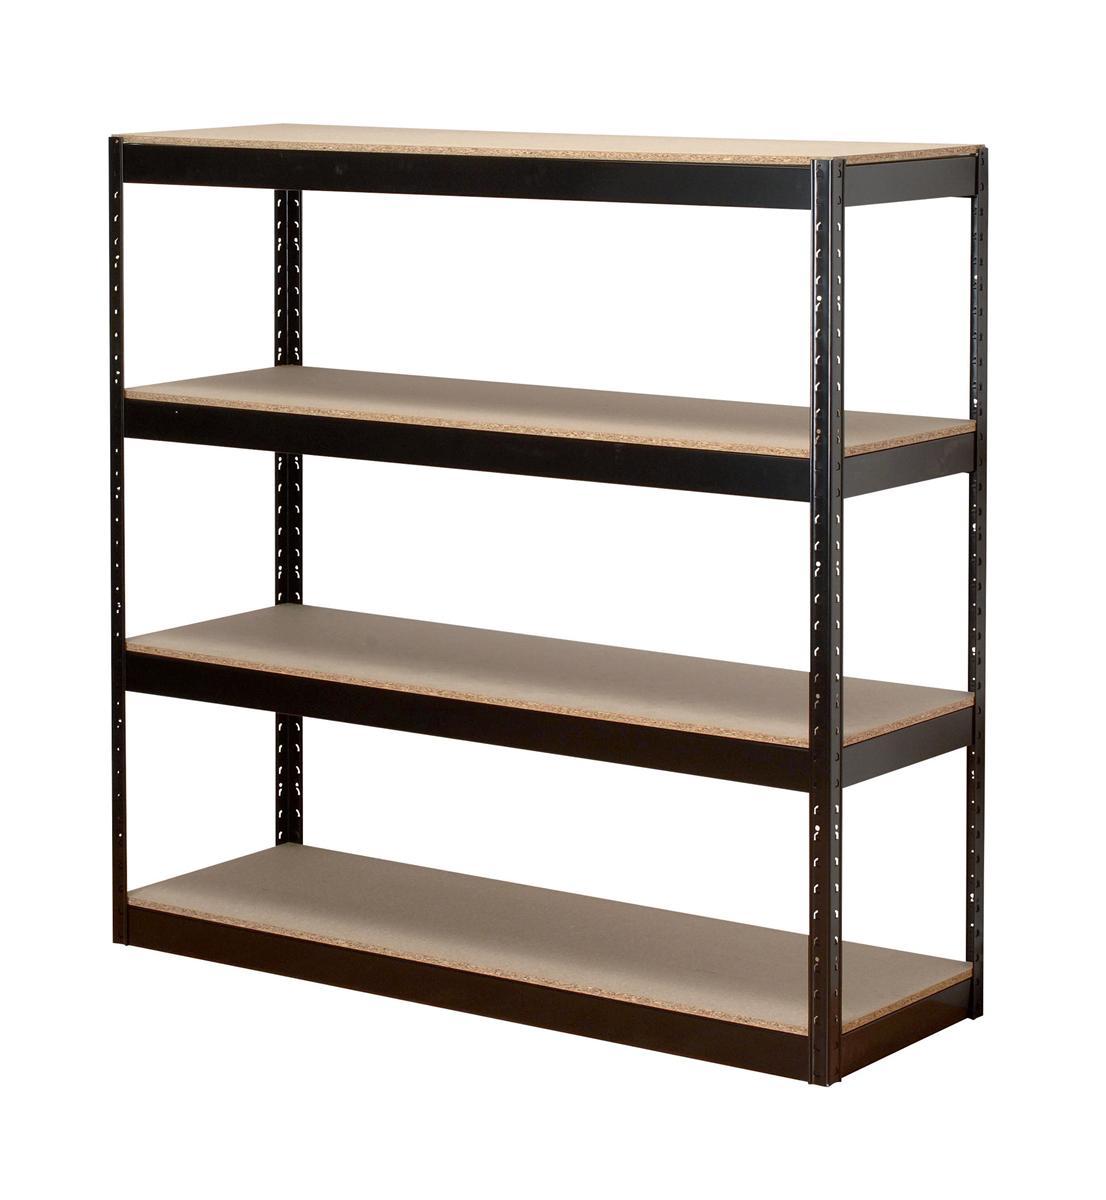 Image for Influx Archive Shelving Unit Heavy-duty Boltless 4 Shelves Capacity 4x 100kg W1320xD450xH1315mm Black